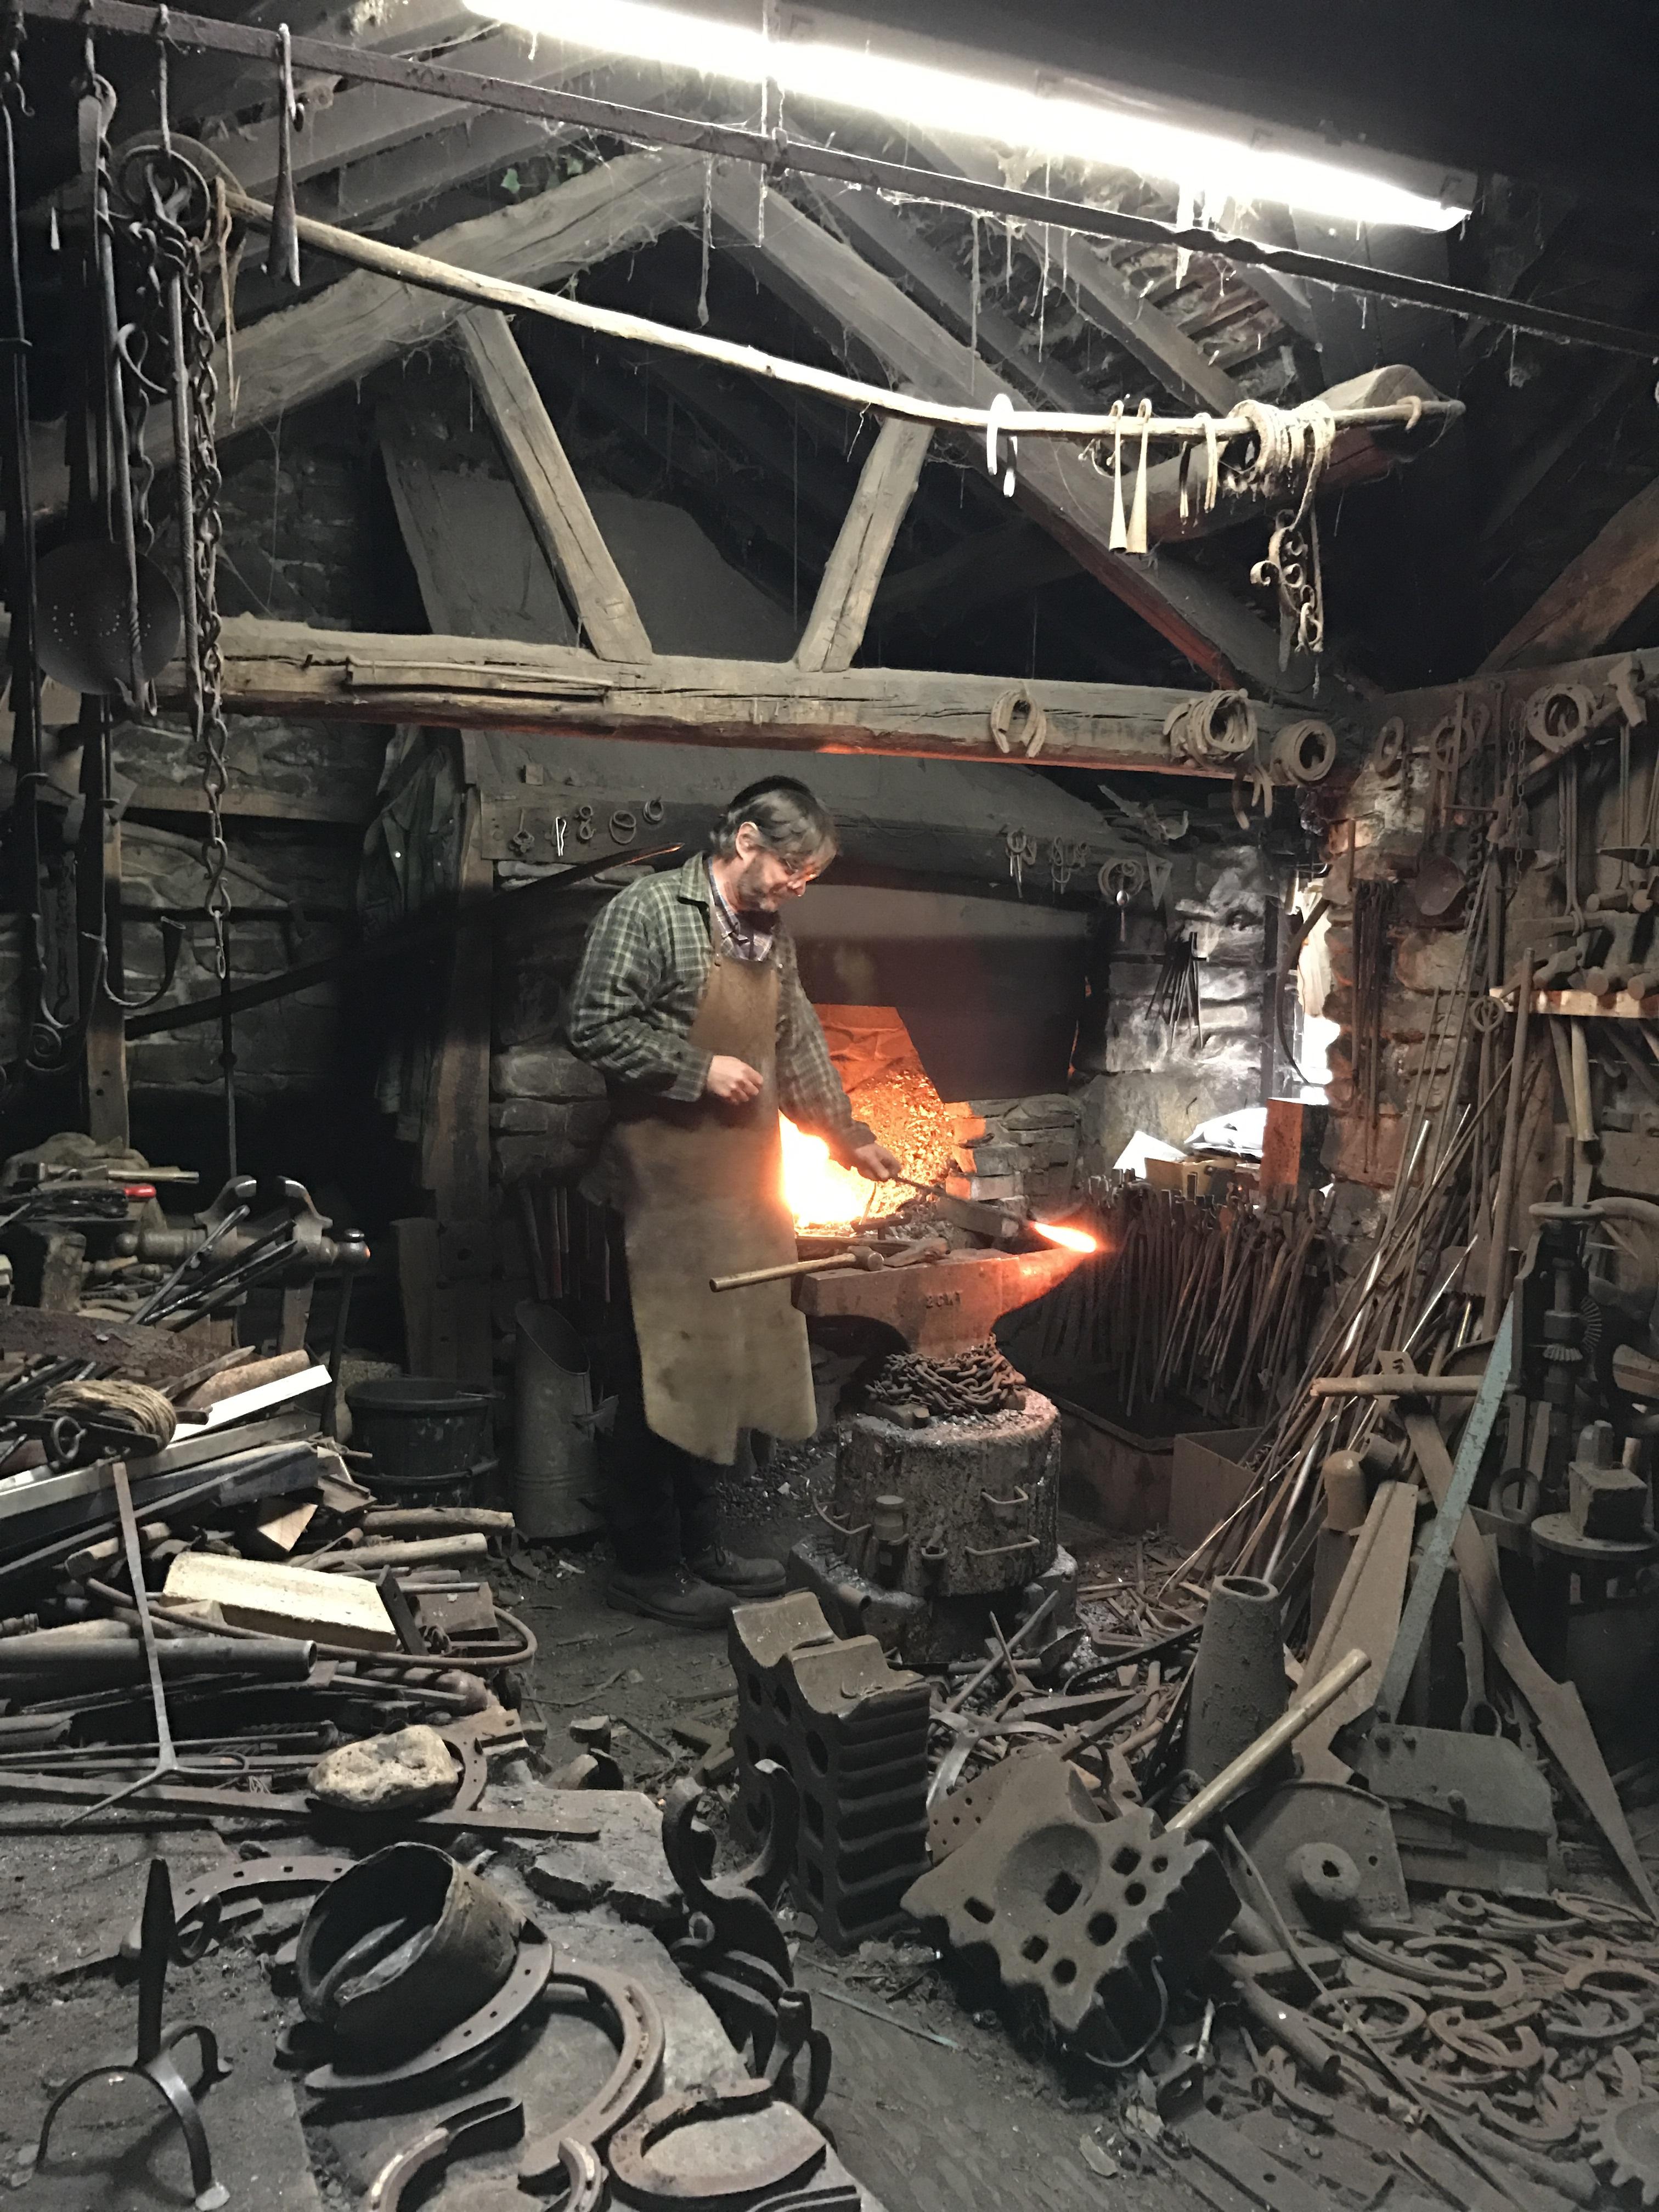 St Fagans blacksmith